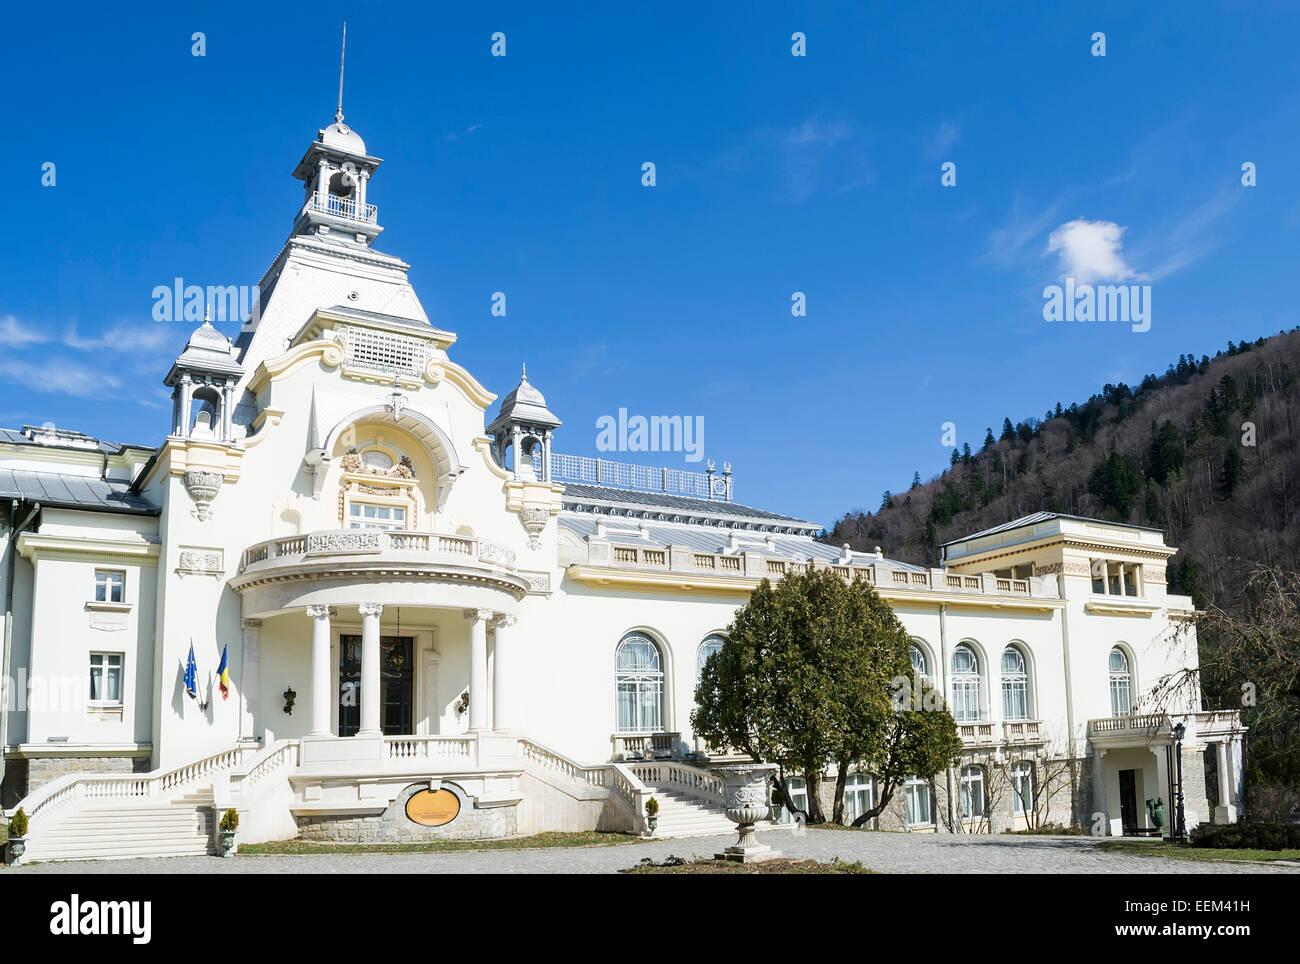 Elegant cultural edifice in early twentieth century neoclassical style - Stock Image